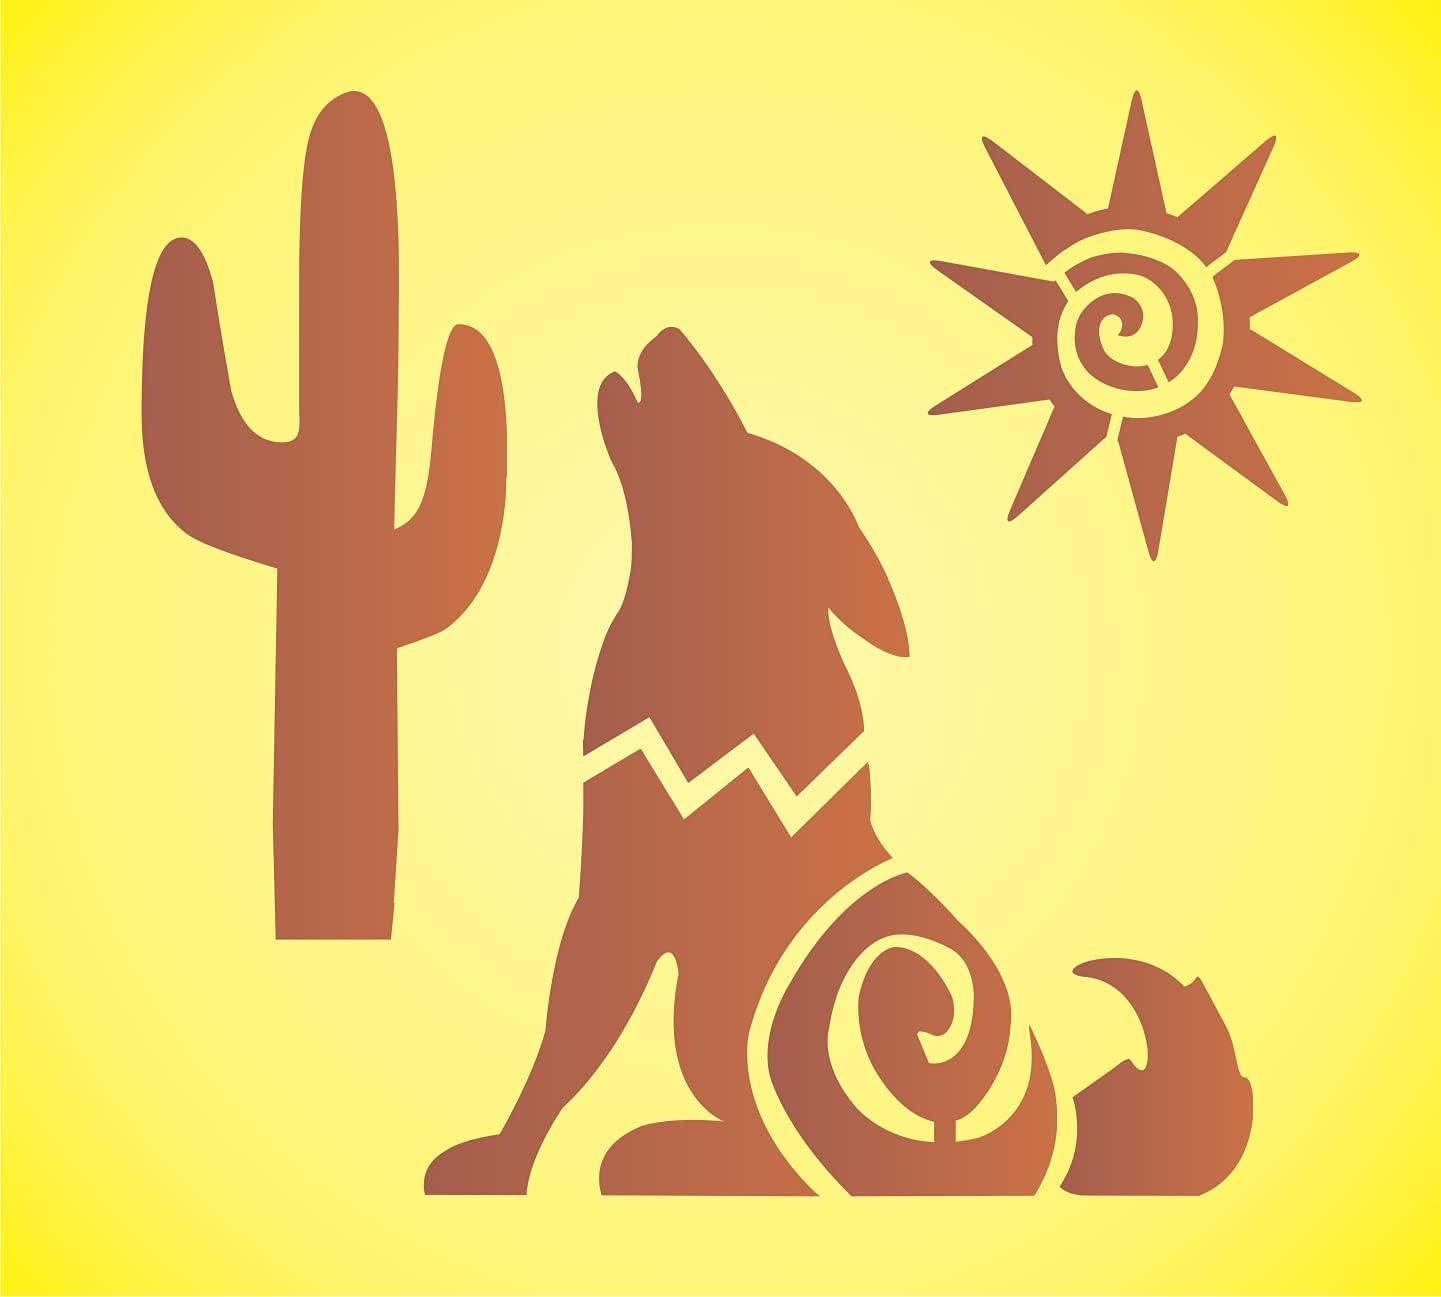 Howling Wolf Stencil Southwest Desert Cactus Kokopelli Sun Aztec Southwest Garden DIY Signs (6